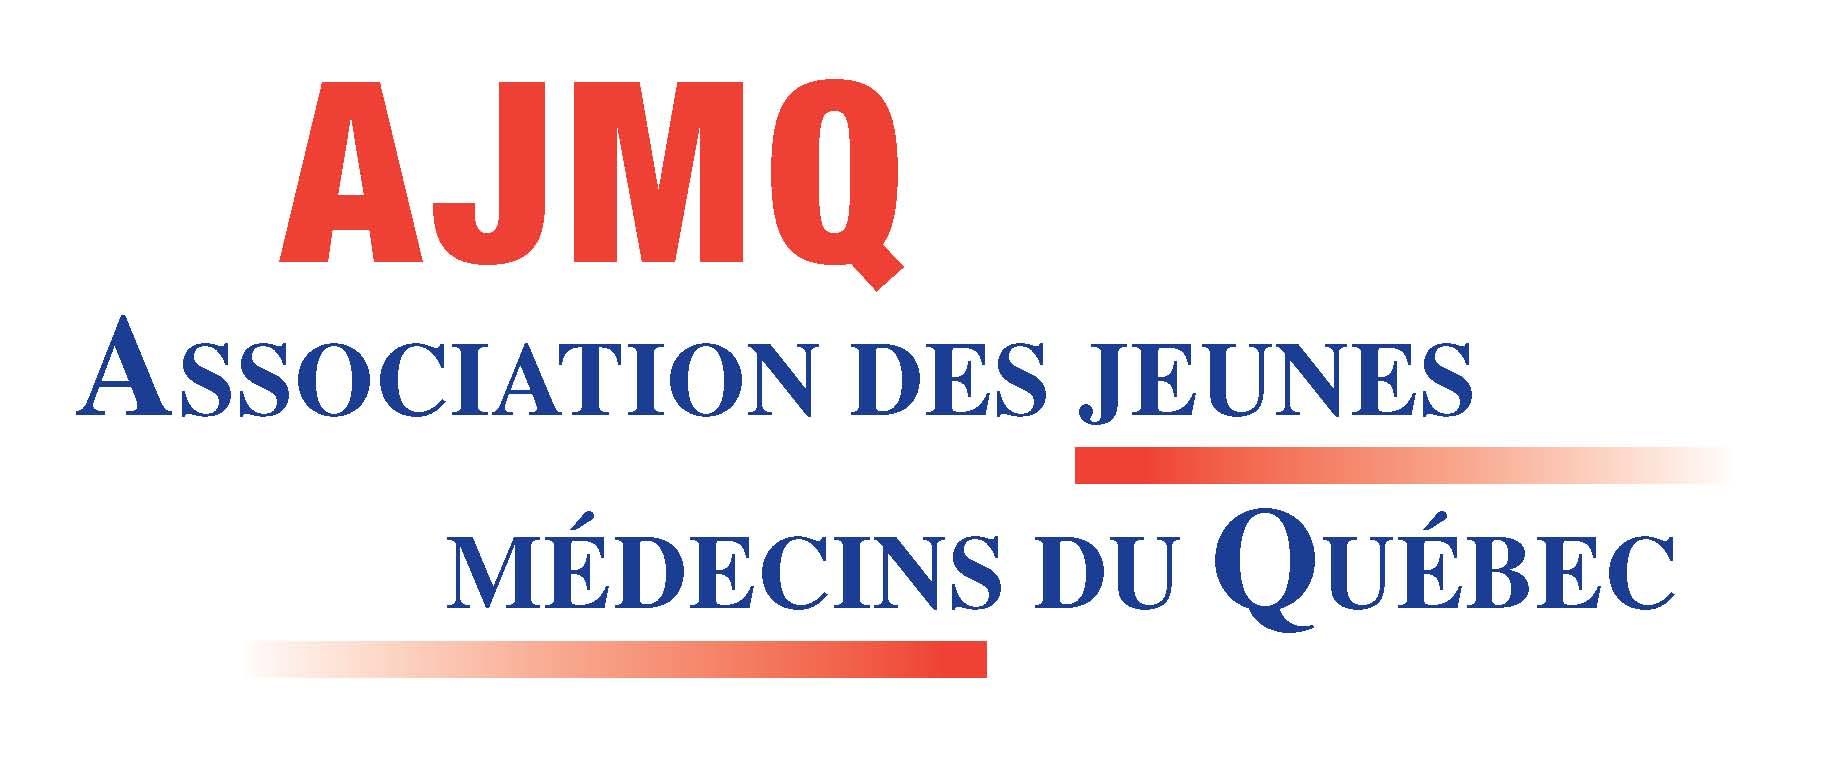 Logo Association des jeunes médecins du Québec (AJMQ)